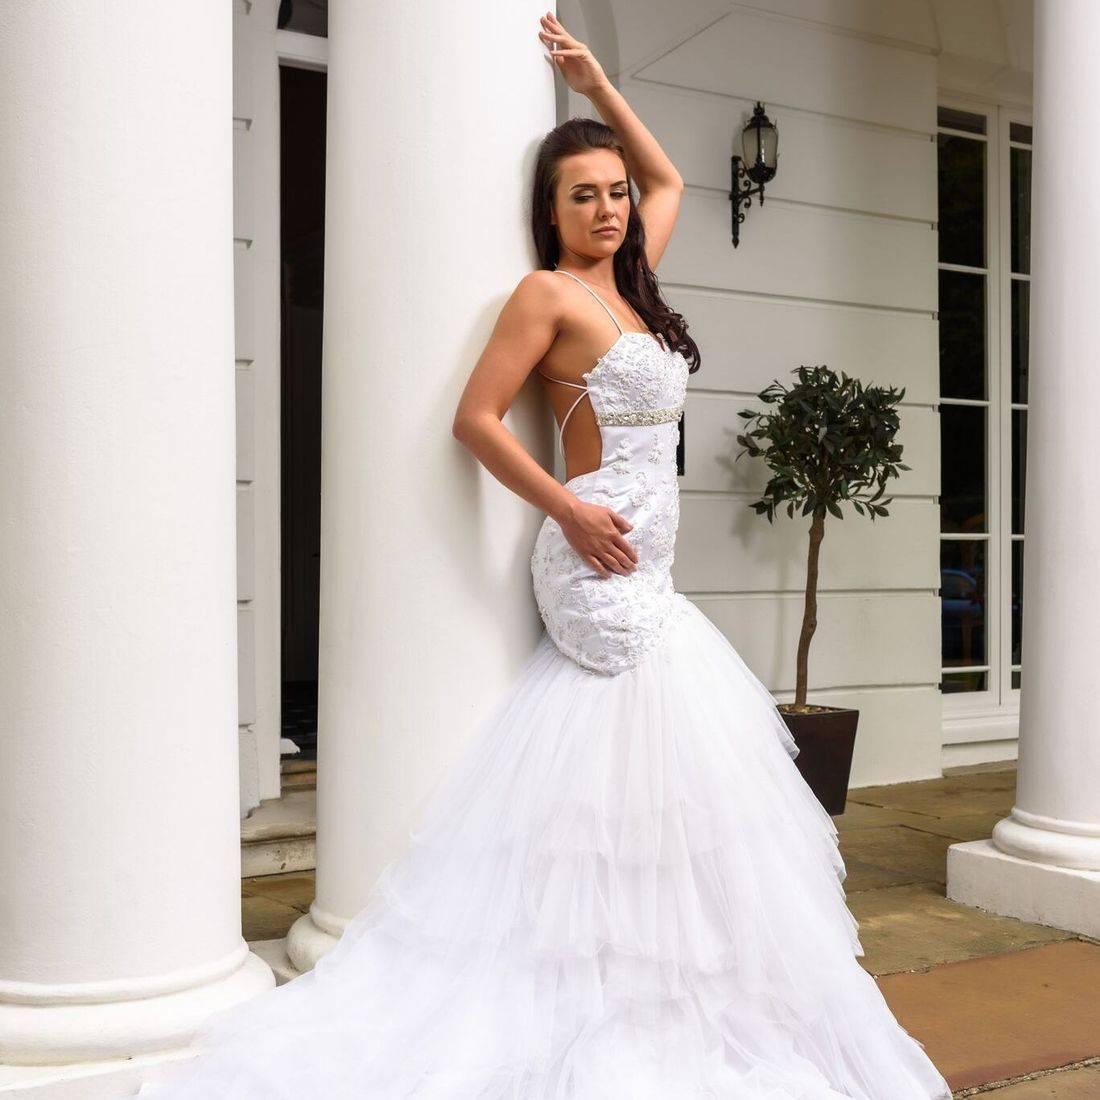 sexy wedding dress, dipped back wedding dress,   open back wedding dress, wedding dresses with spaghetti straps, layered skirt wedding dress